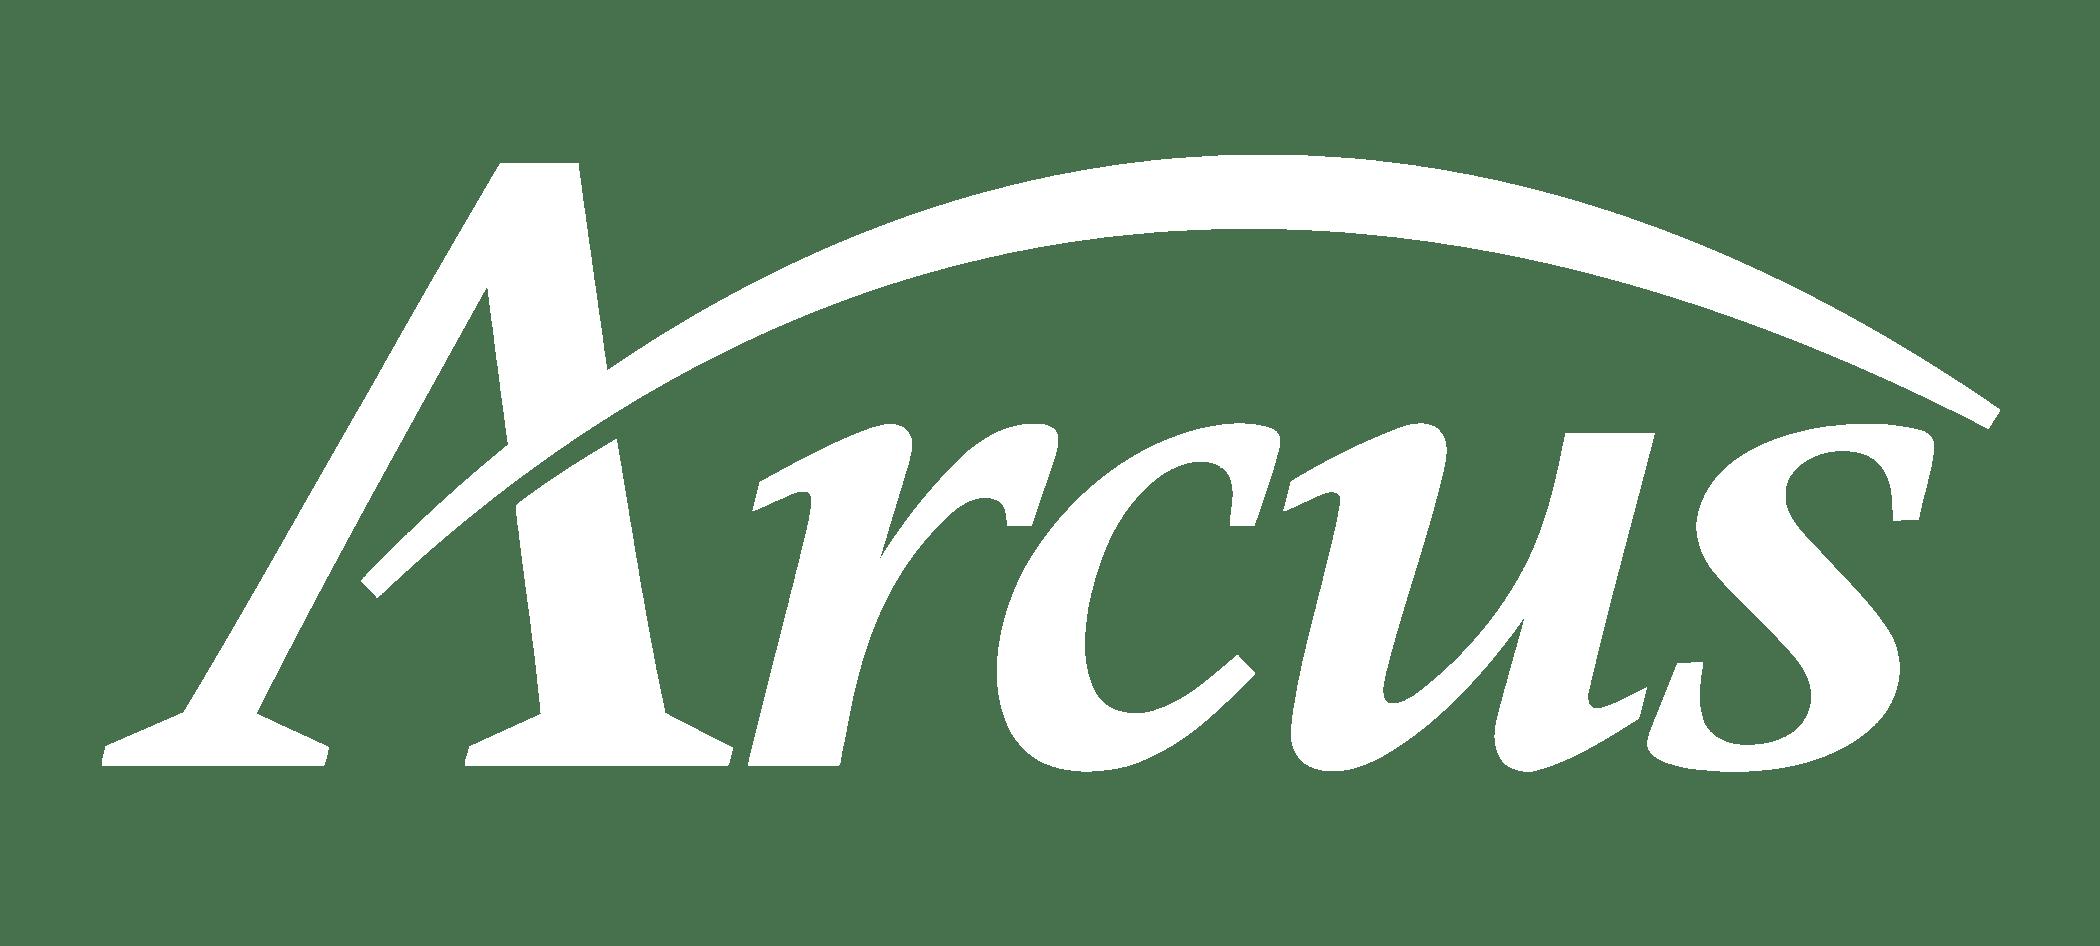 Arcus logo-hvit-01.png